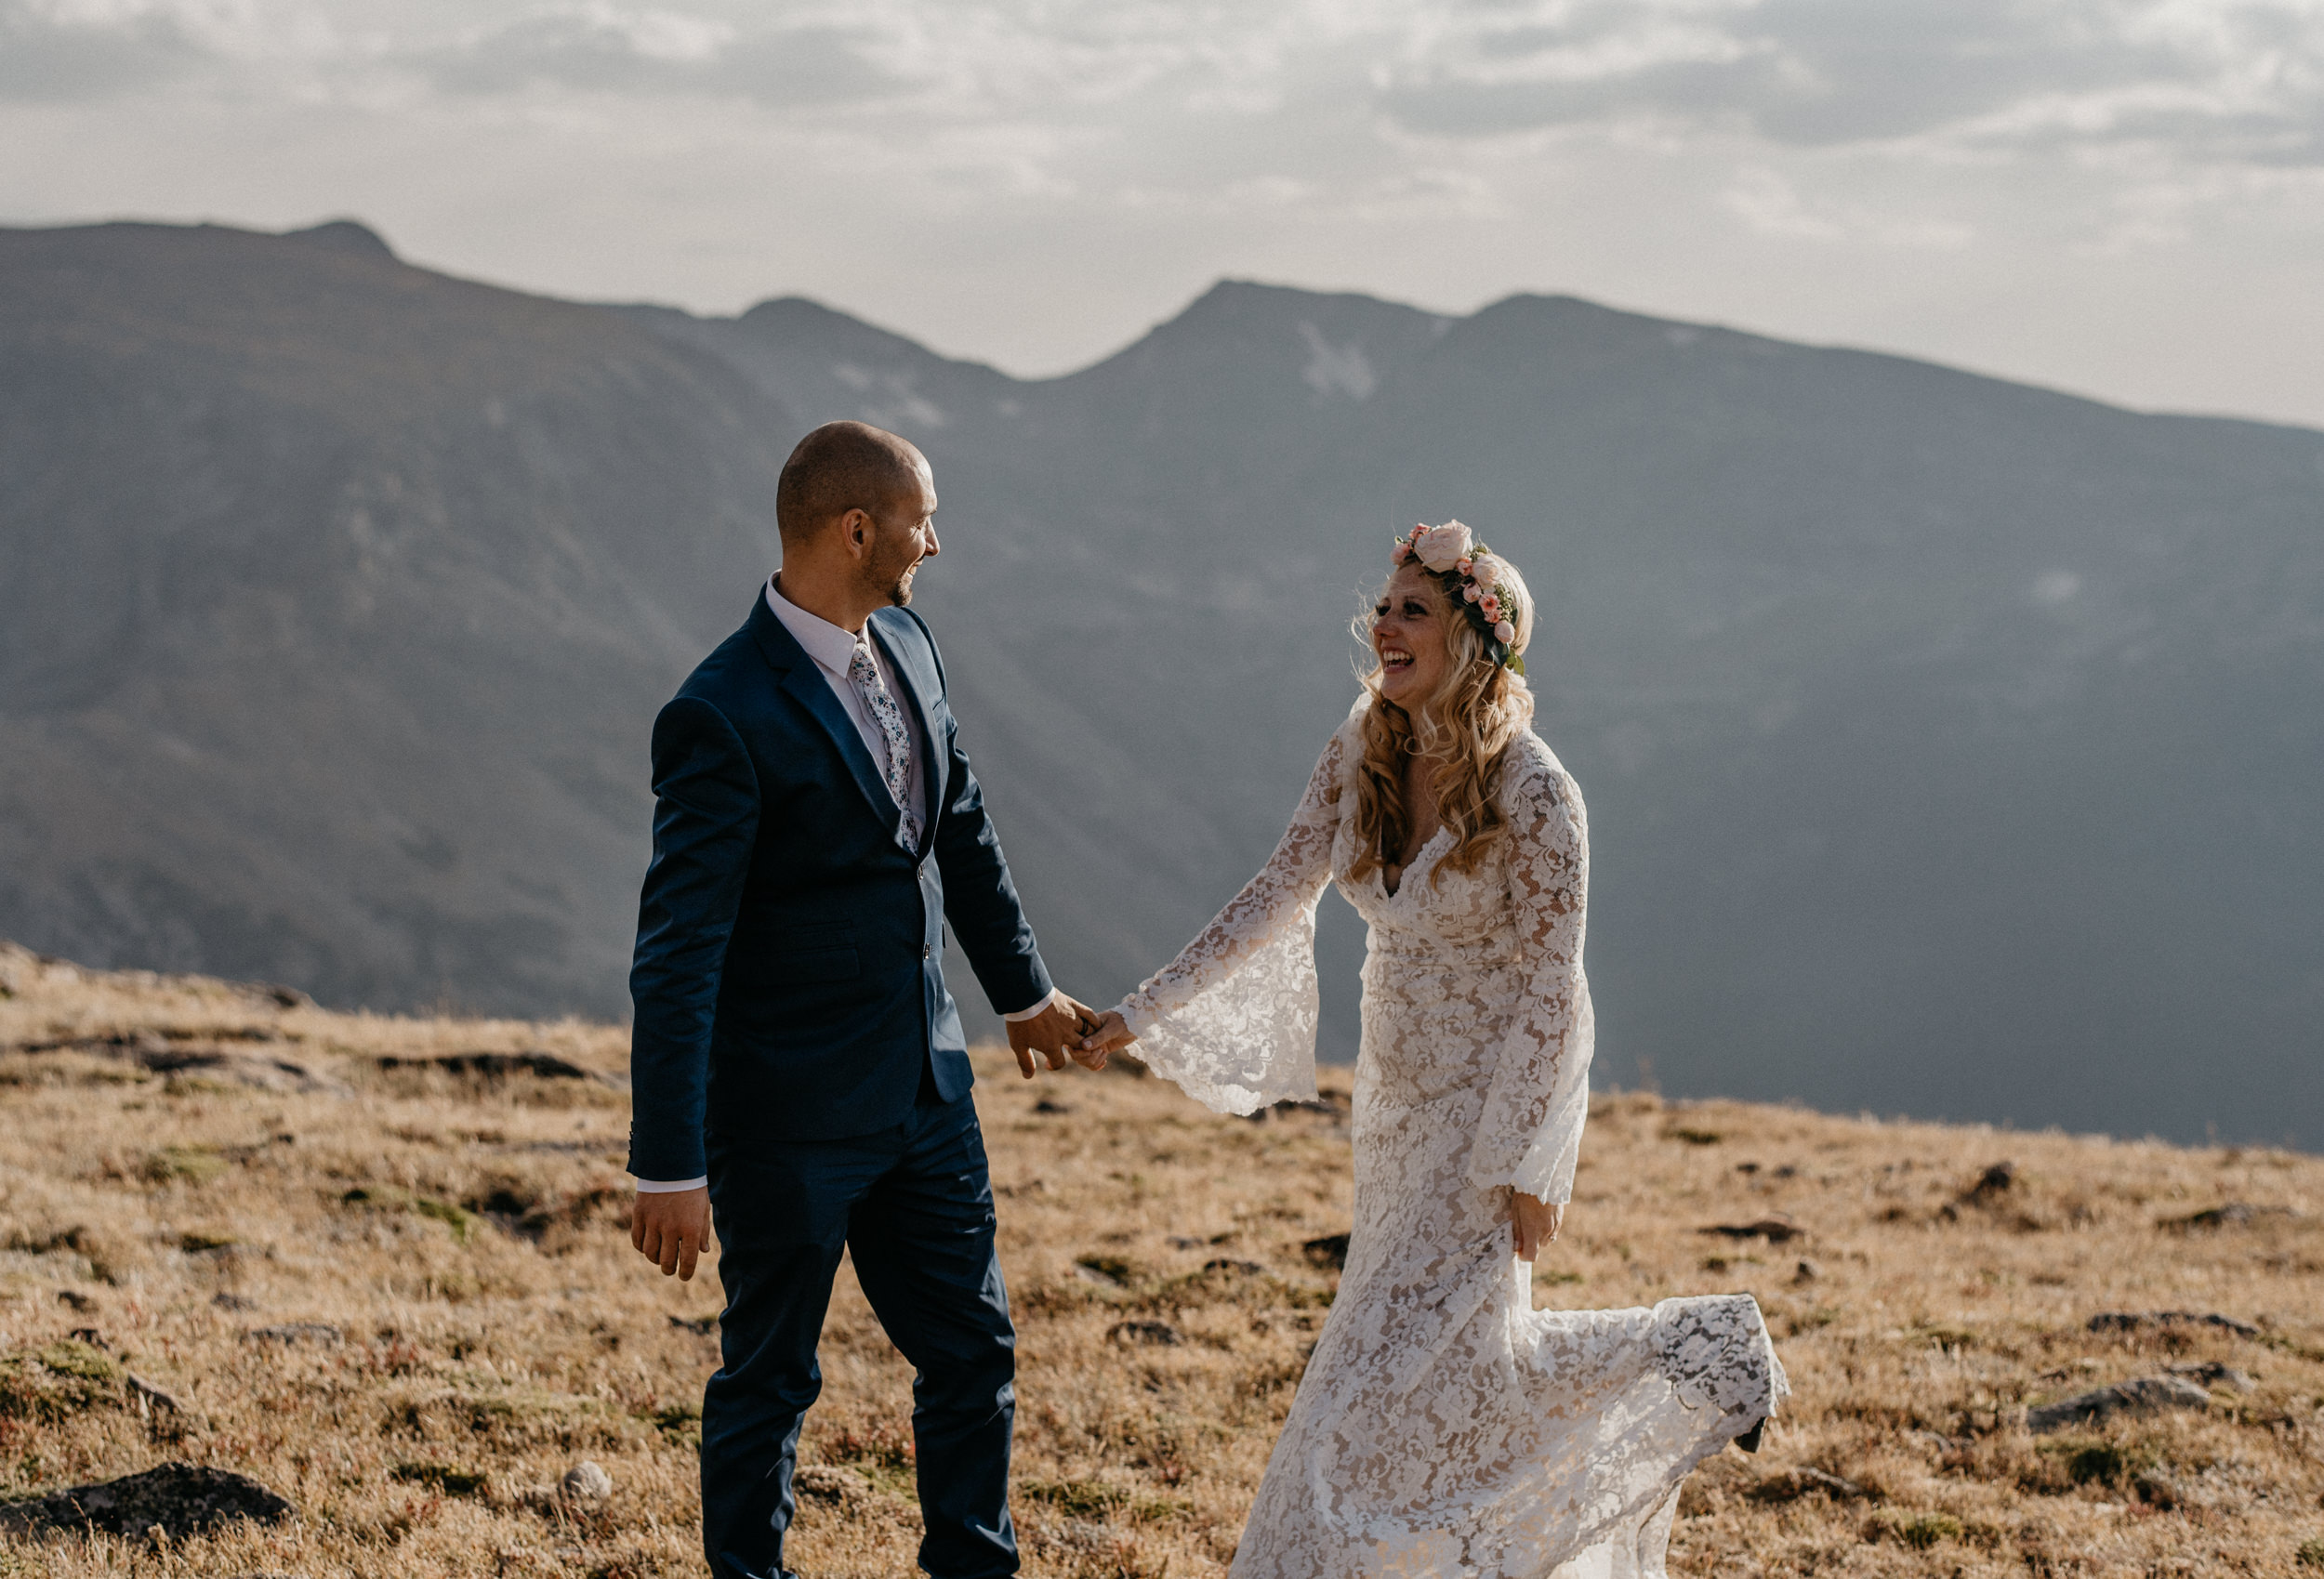 Colorado boho elopement and wedding photographer.